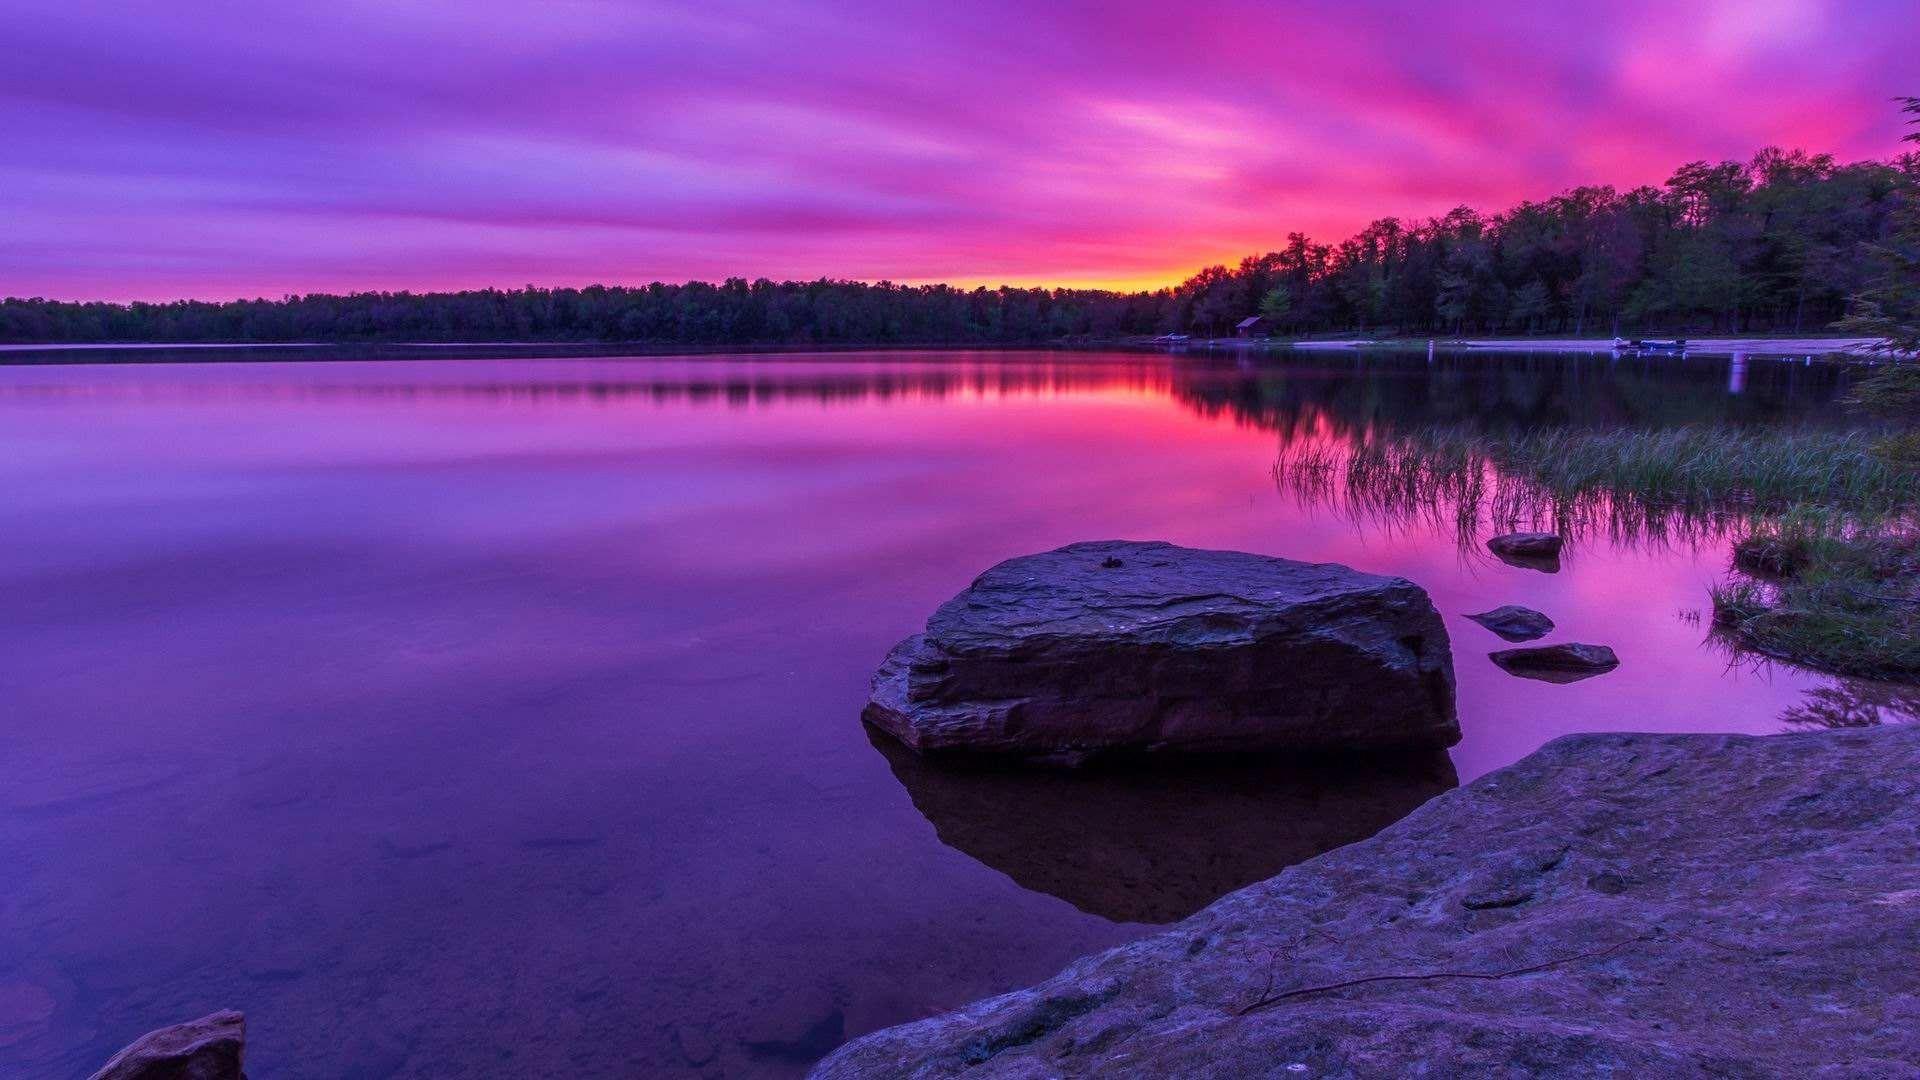 Purple Sunset download wallpaper image